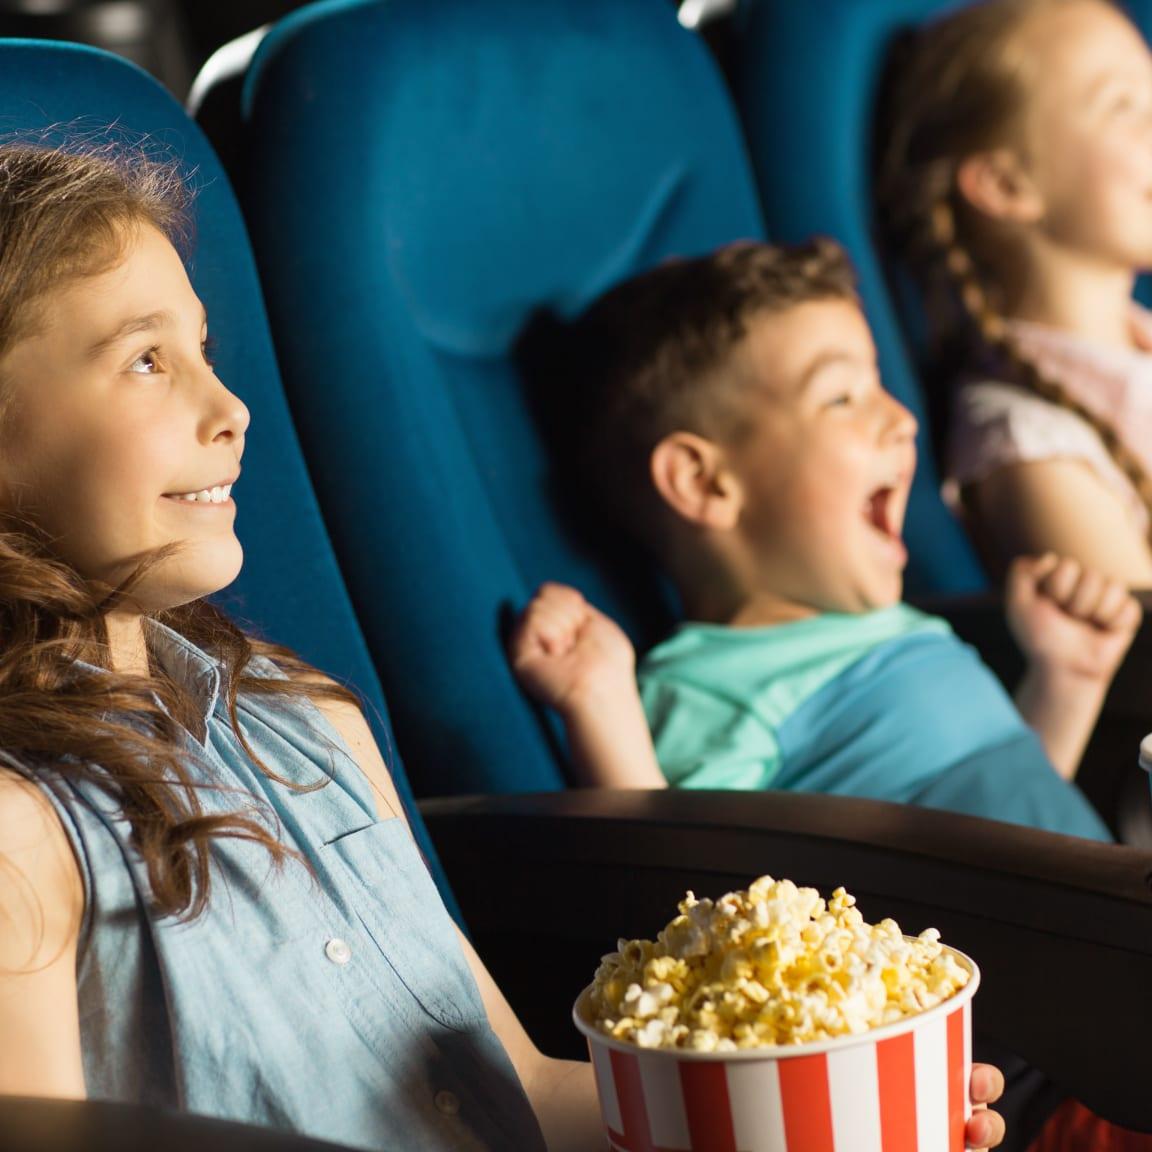 New in cinemas: This season's must-watch movies